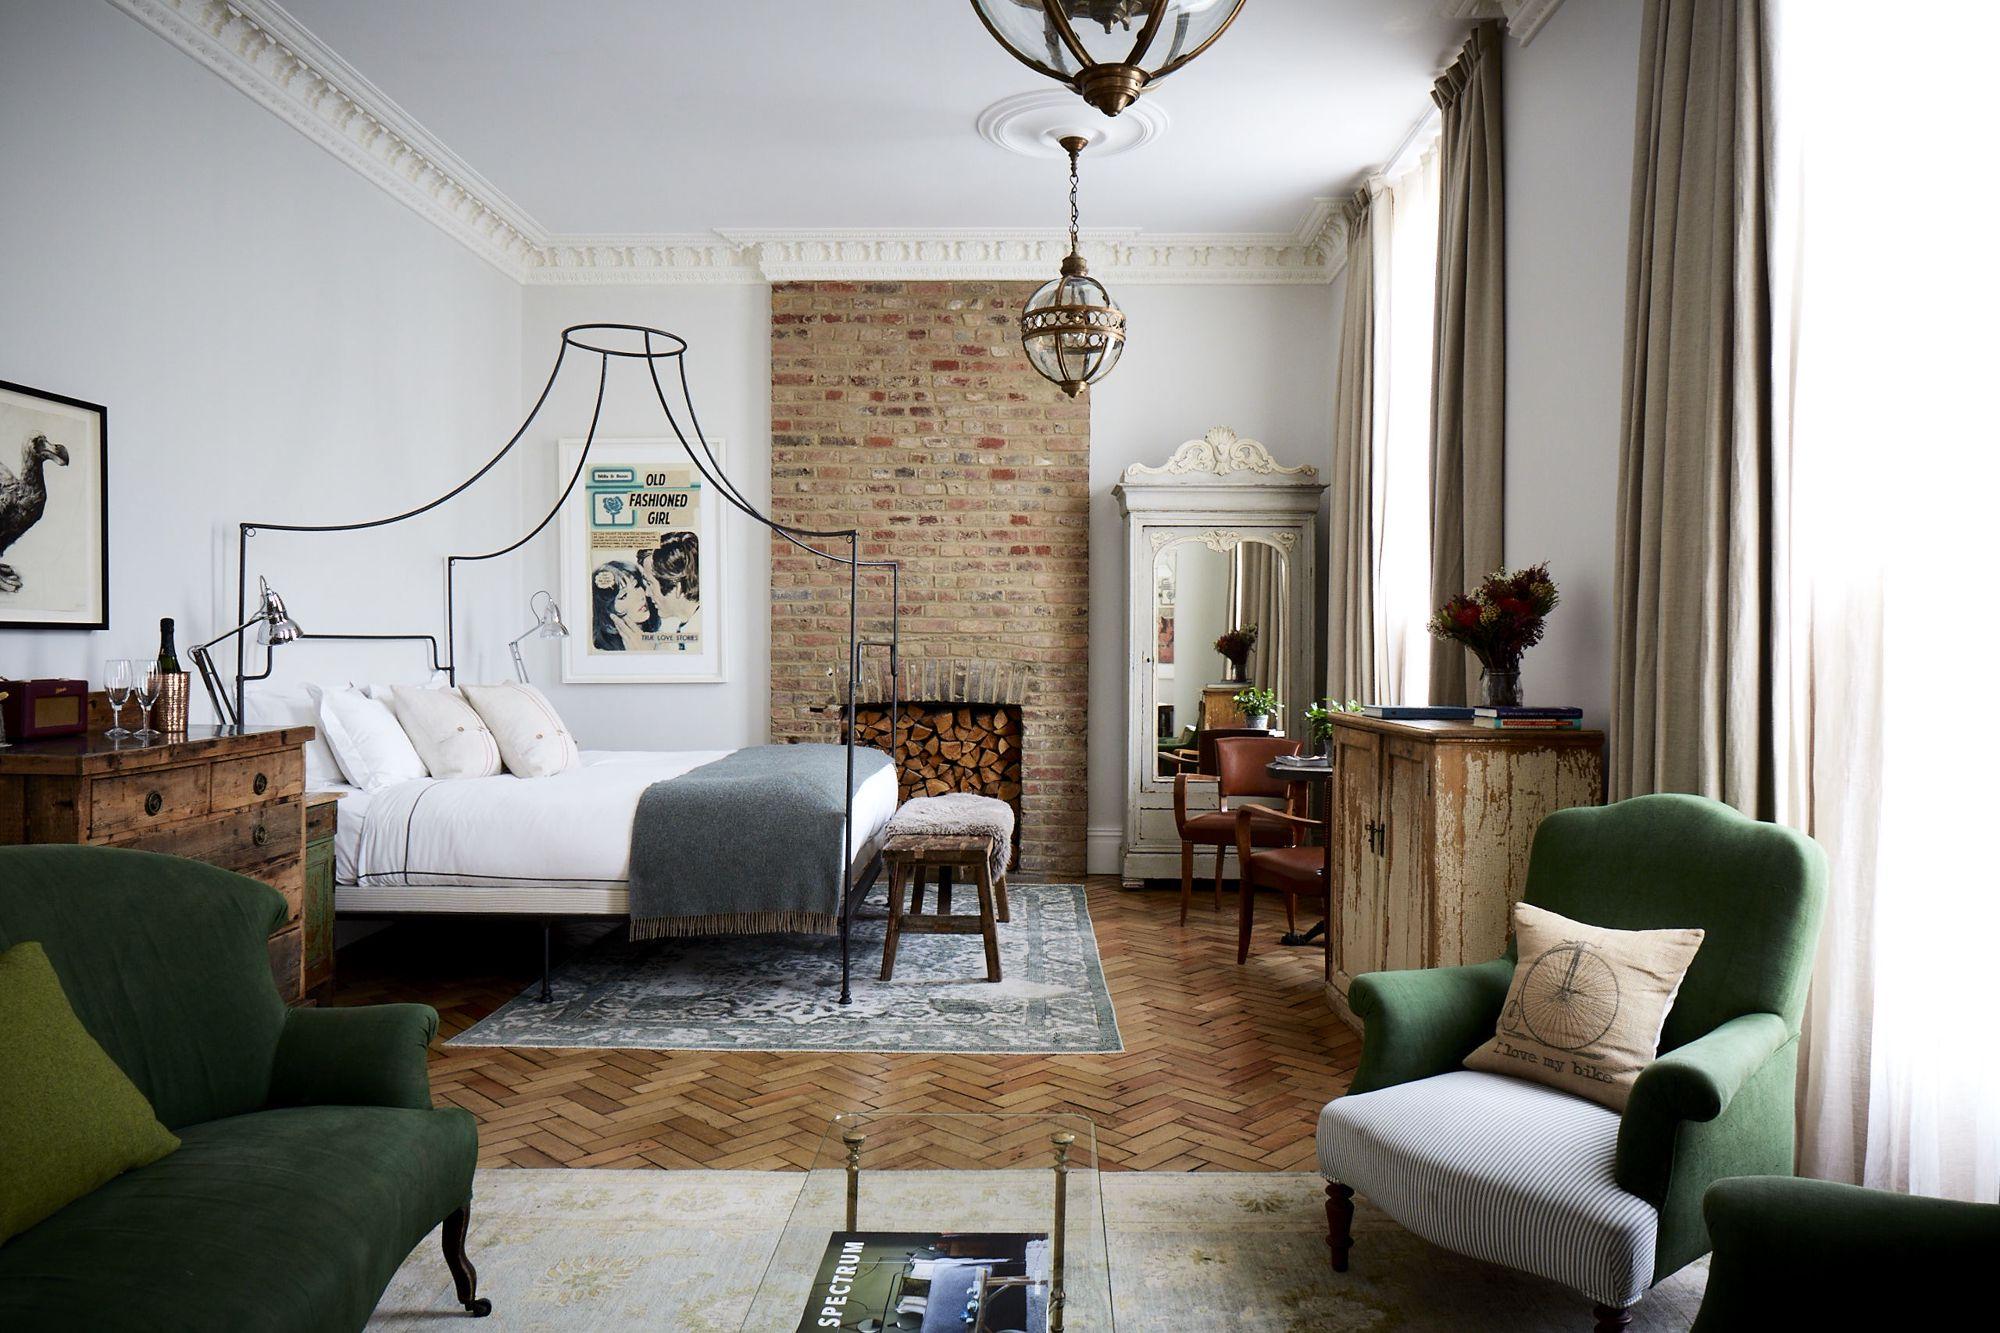 Hotels, B&Bs, Hostels & Self-Catering in London